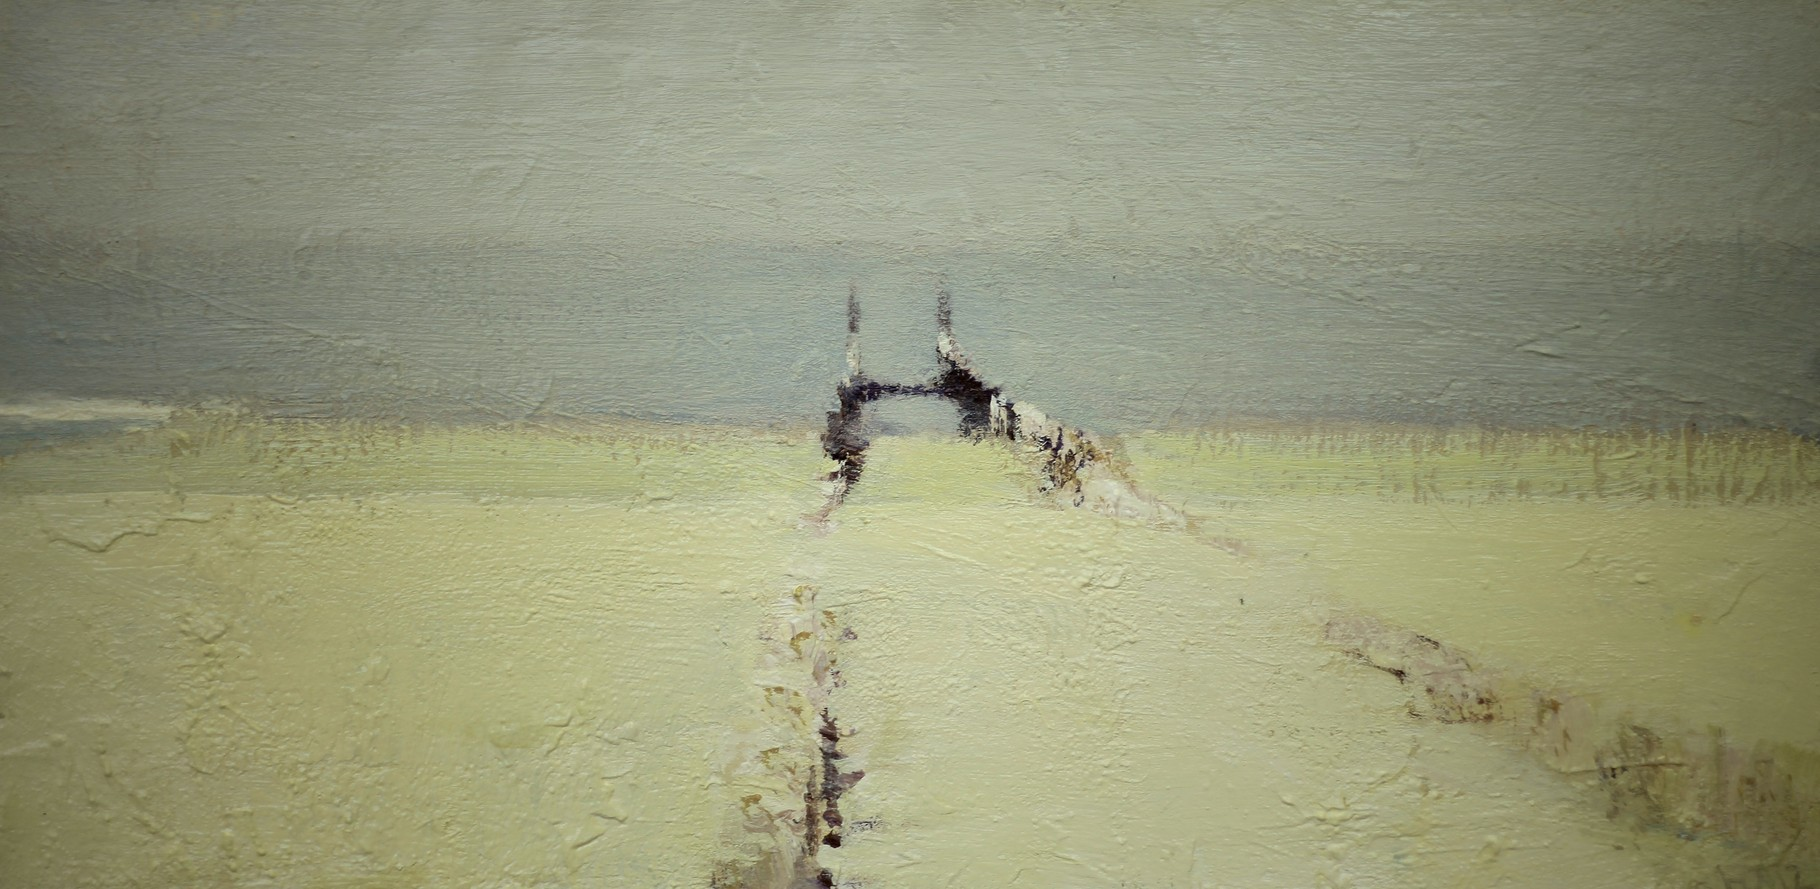 Ю. Первушин.          Домбург.        2012 г.       Холст, акрил.      40,5х80 см.